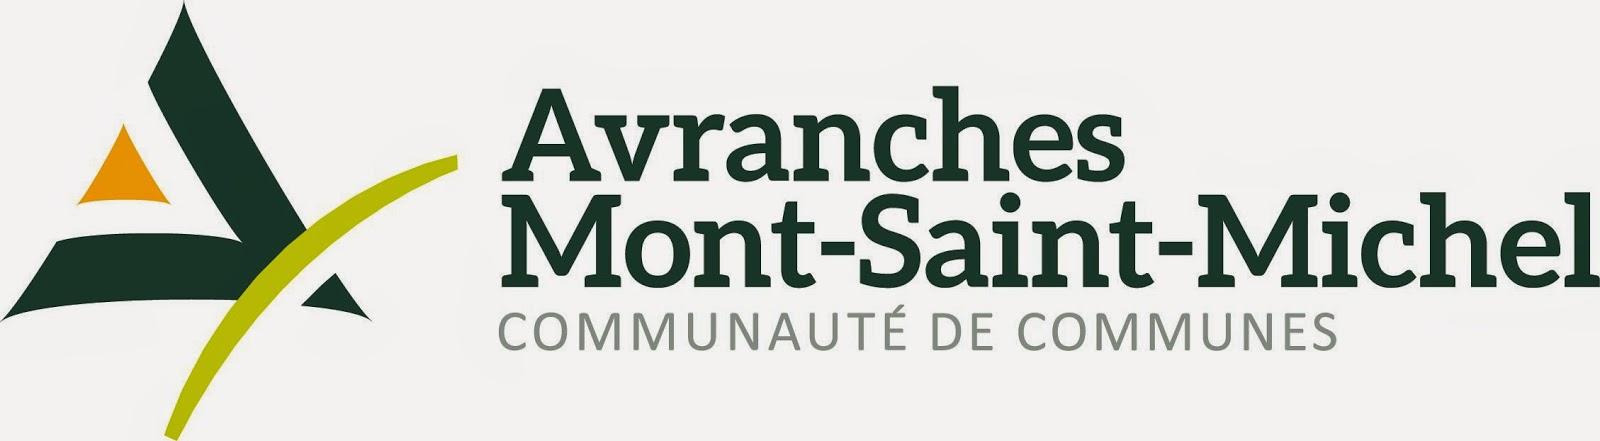 http://www.cc-avranchesmontsaintmichel.fr/